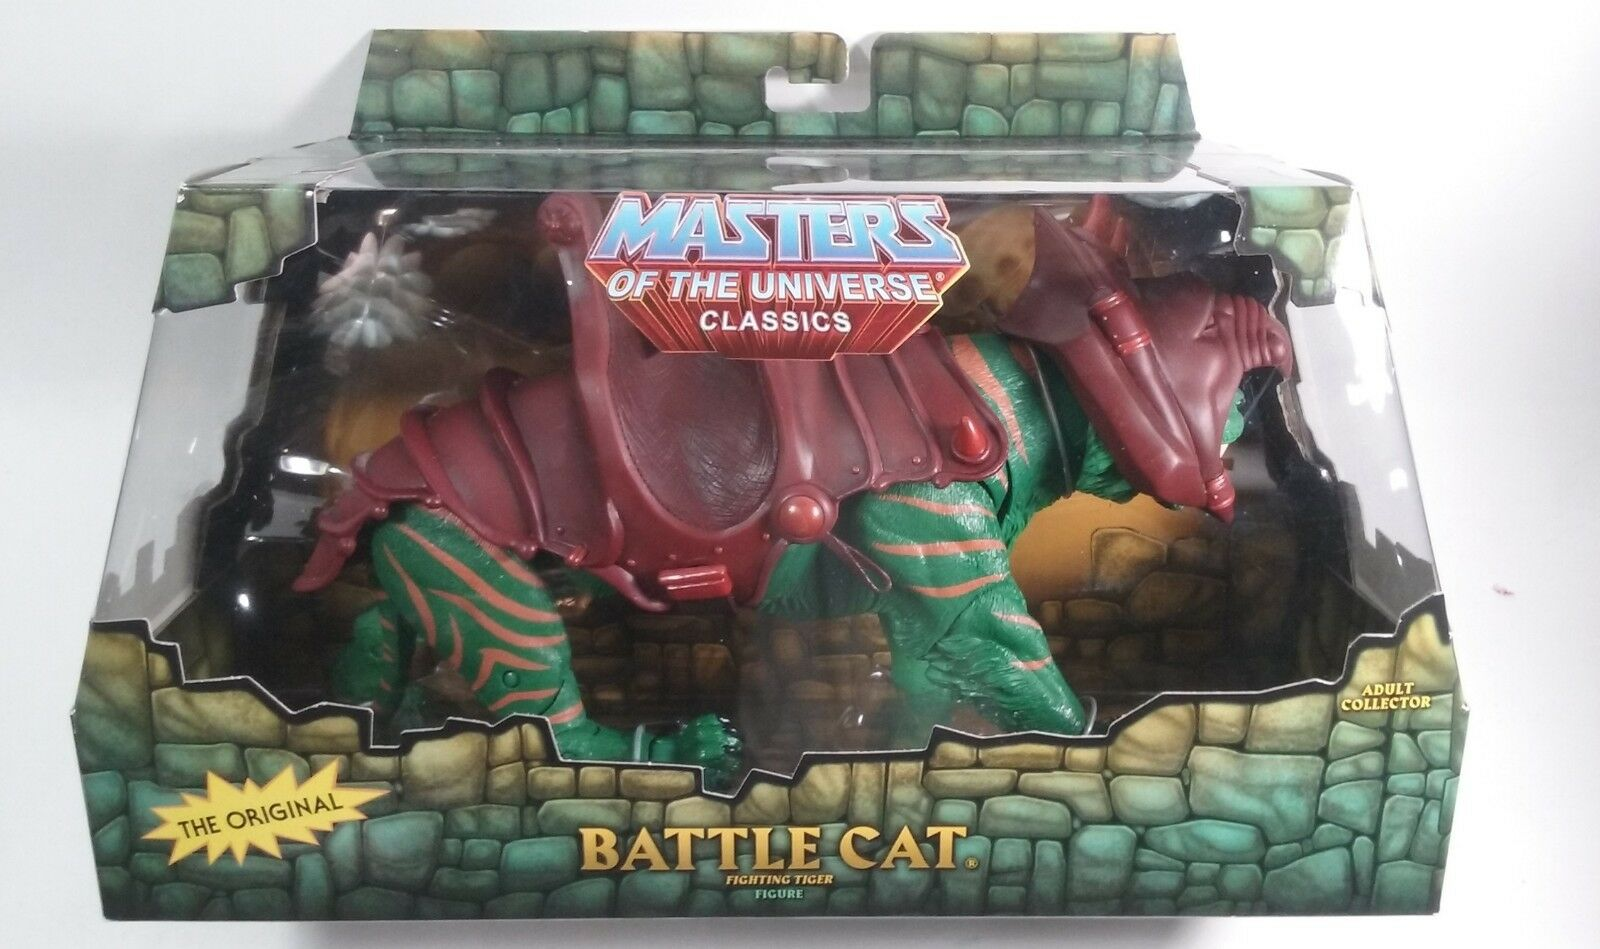 MOTUC, Battle Cat, Masters of the Universe Classics, sealed box box box MISB, He-Man 5c5acc